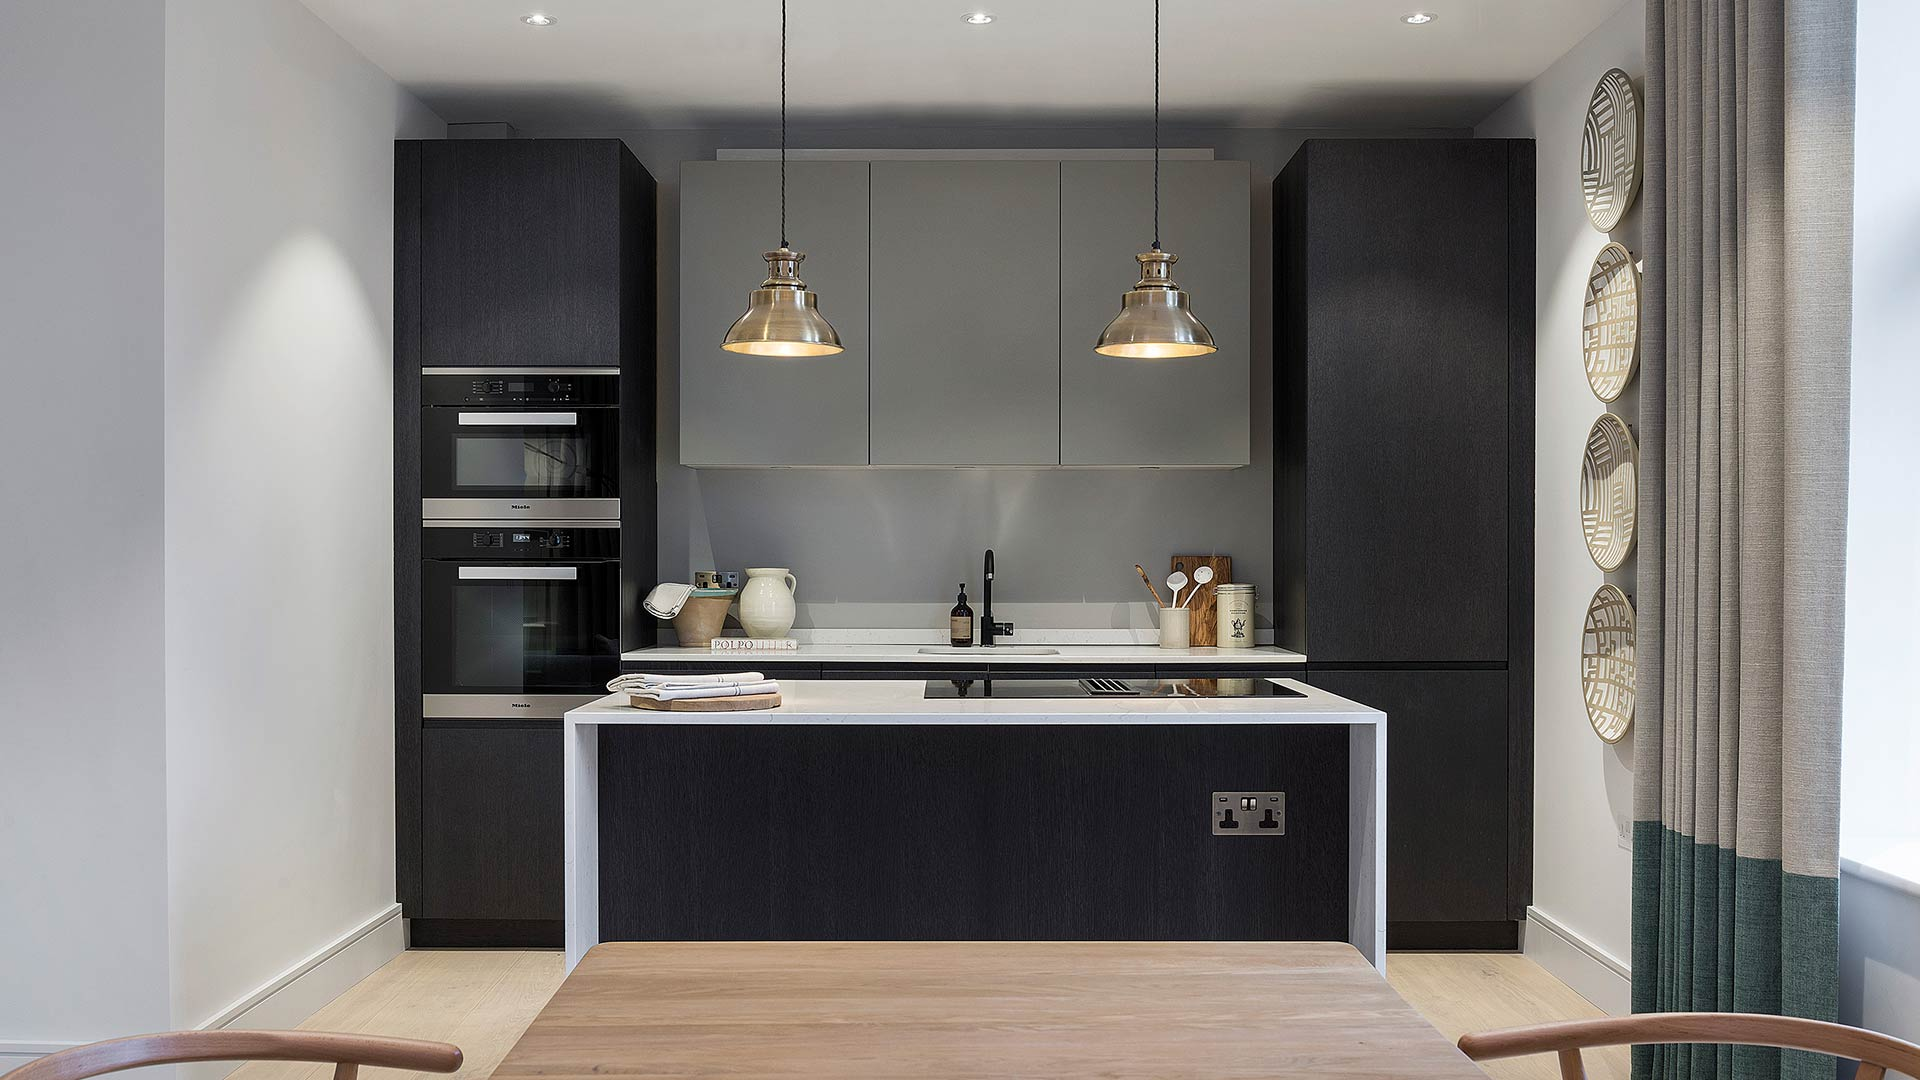 Fitted Kitchen with island and built-in linear composition   TM Italia - 20181101_TMItalia_realizzazione_cucinalineareconisola_01